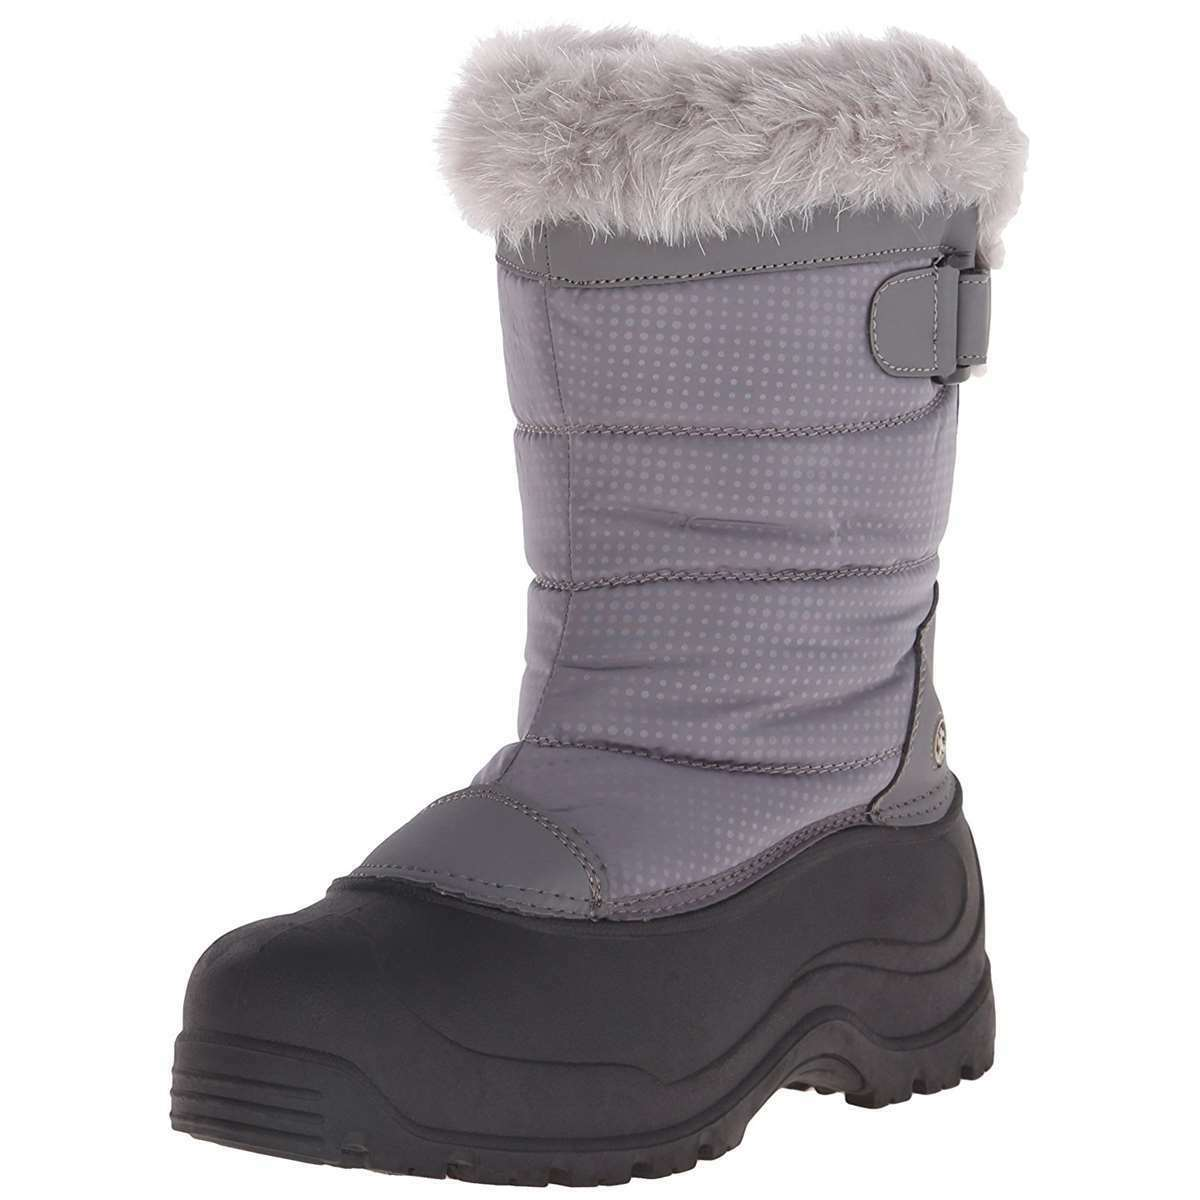 damen Snow Stiefel Insulated Winter Stiefel grau -25F Northside Saint Helens NEW